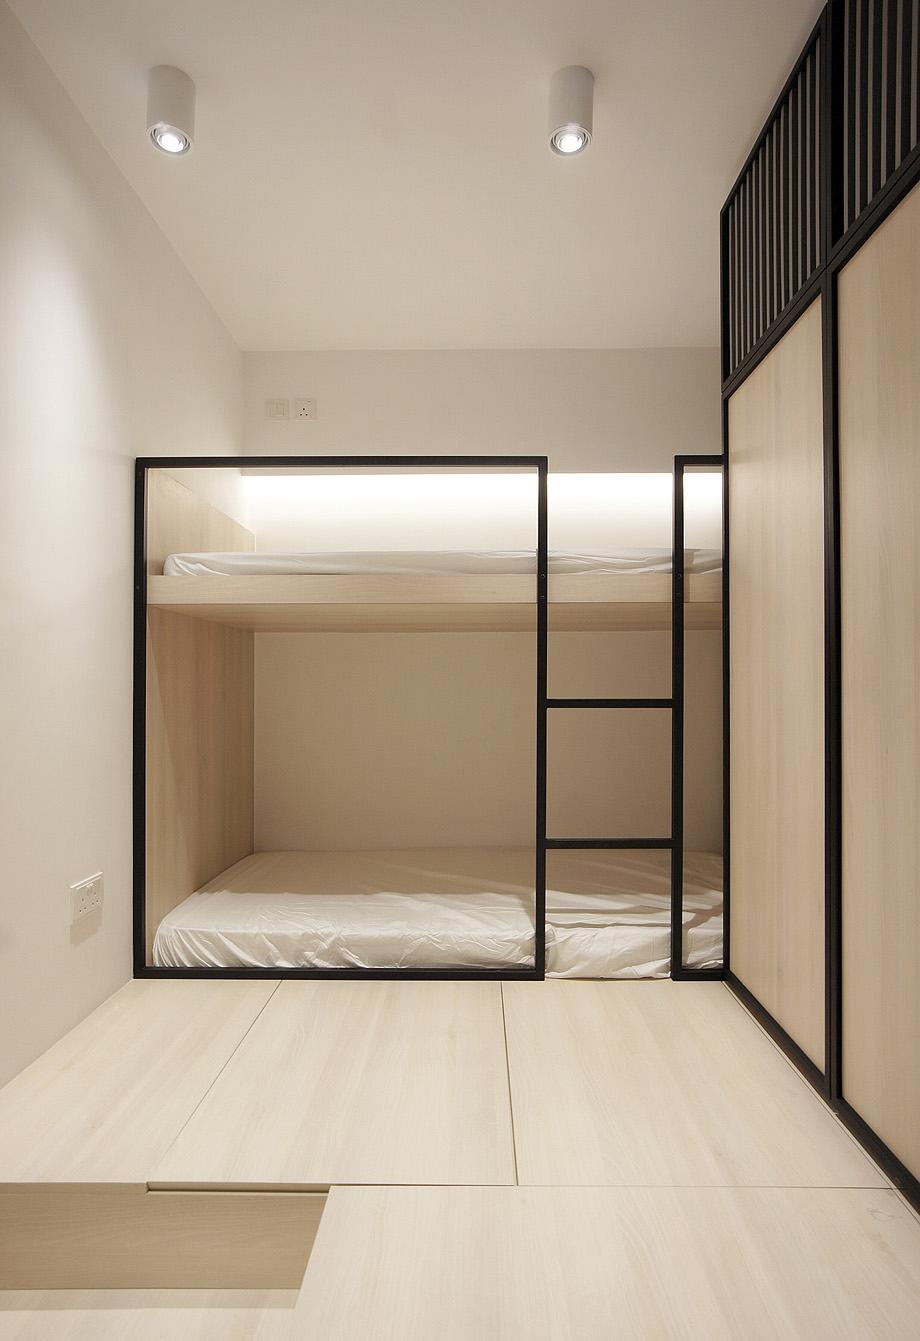 apartmento srk de human w design - foto human w design (9)